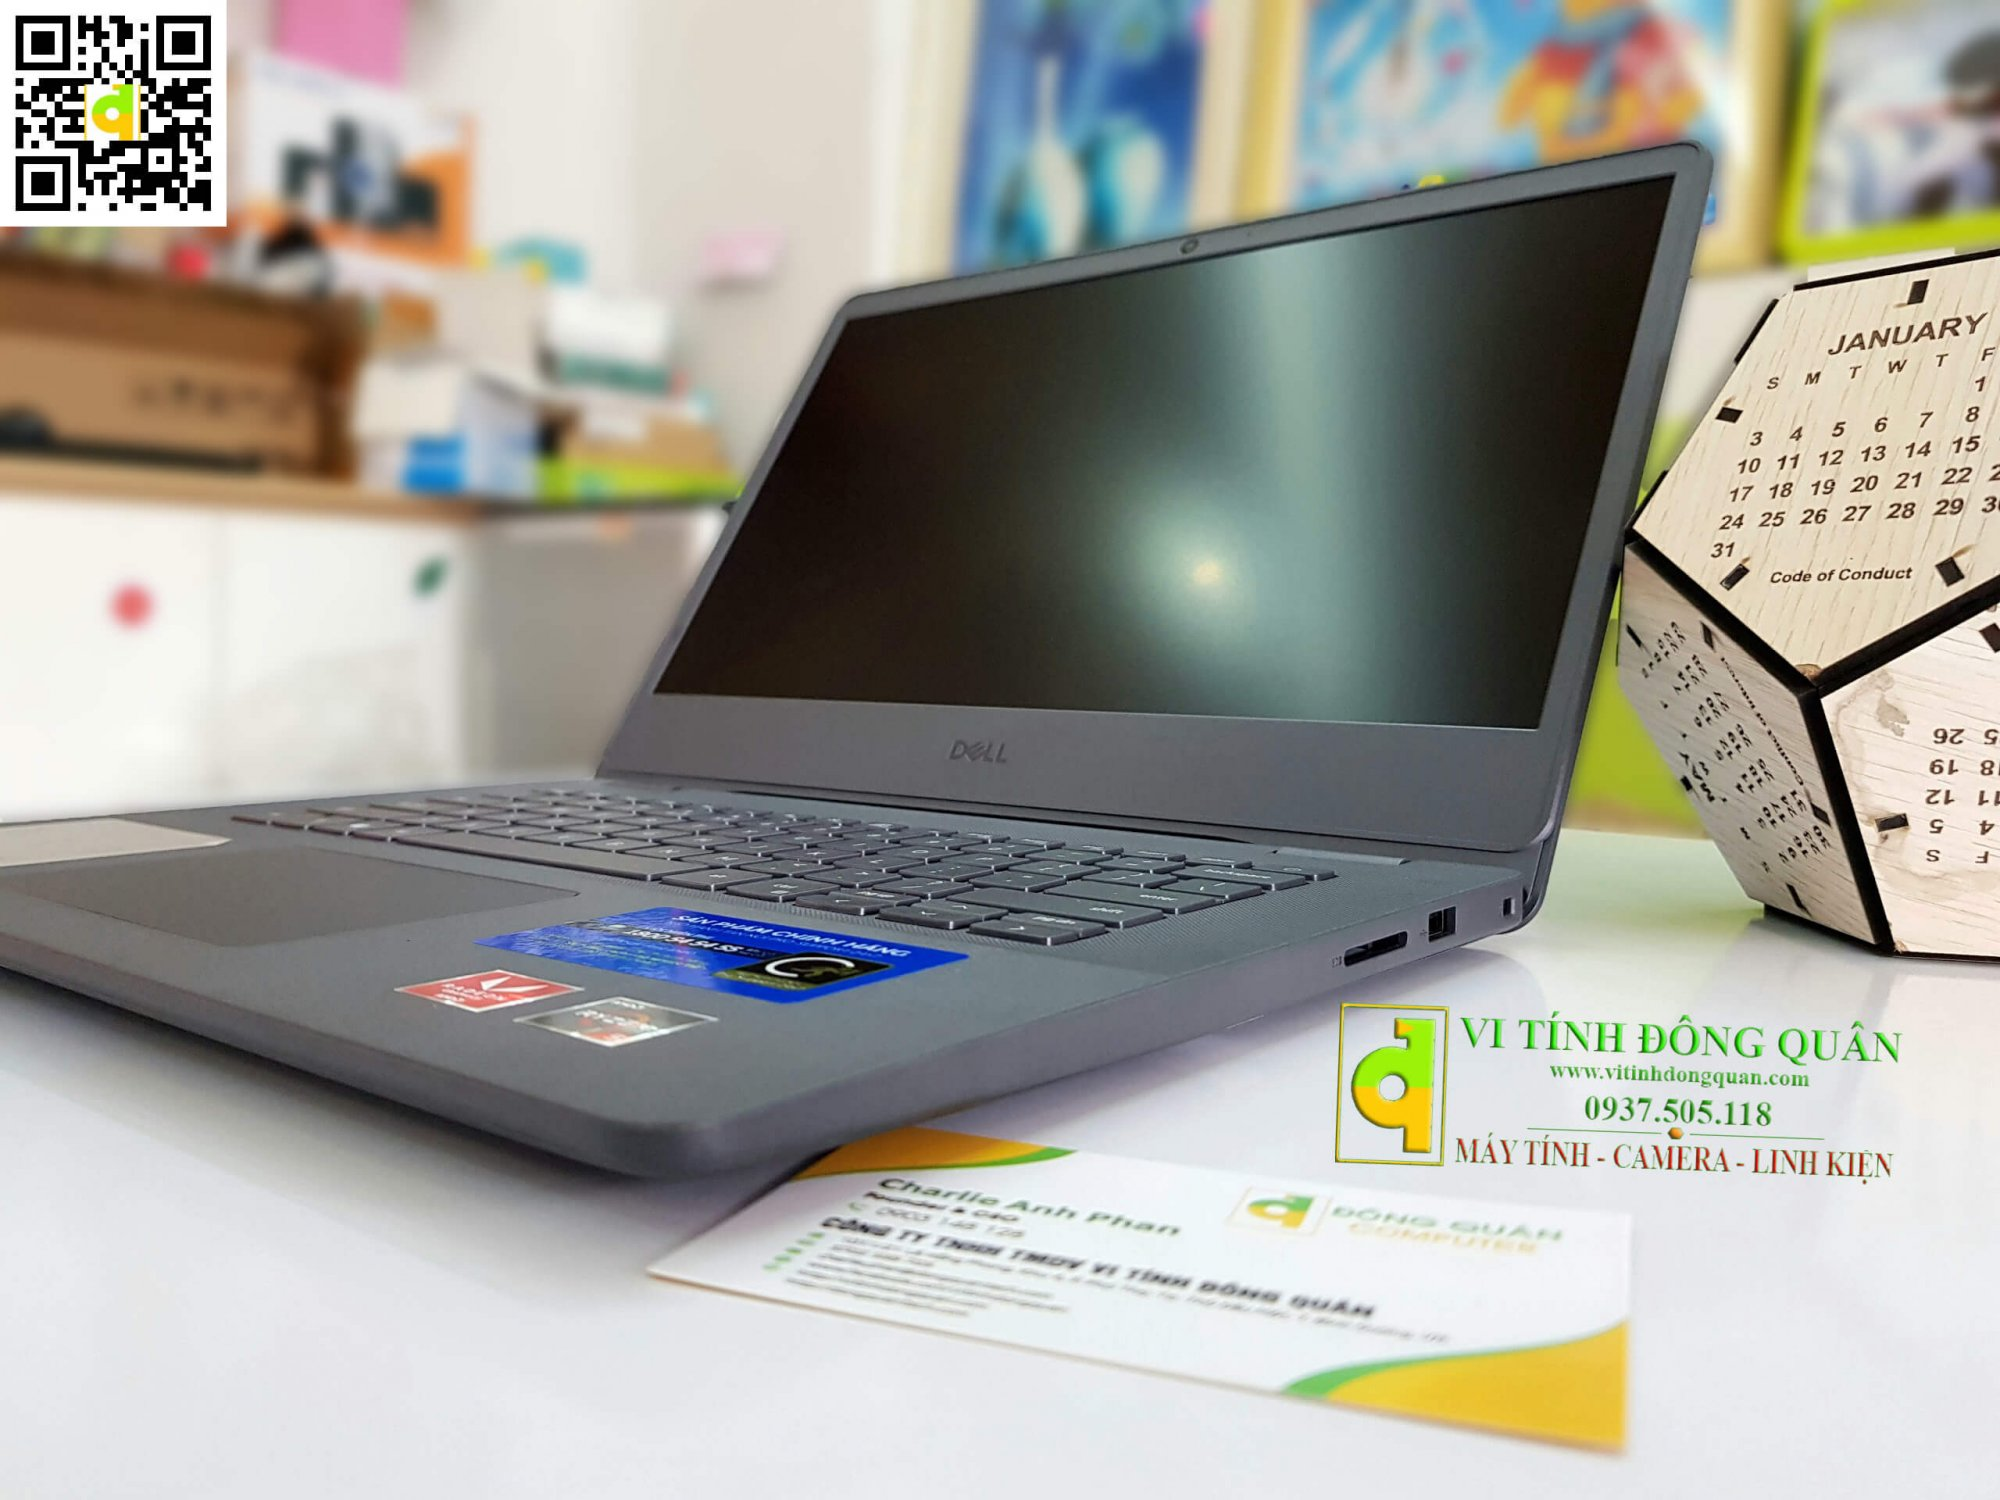 "Laptop Dell Vostro V3405 V4R53500U001W/AMD R5 - 3500U/4G/256G SSD/14""FHD/Win10/Đen"